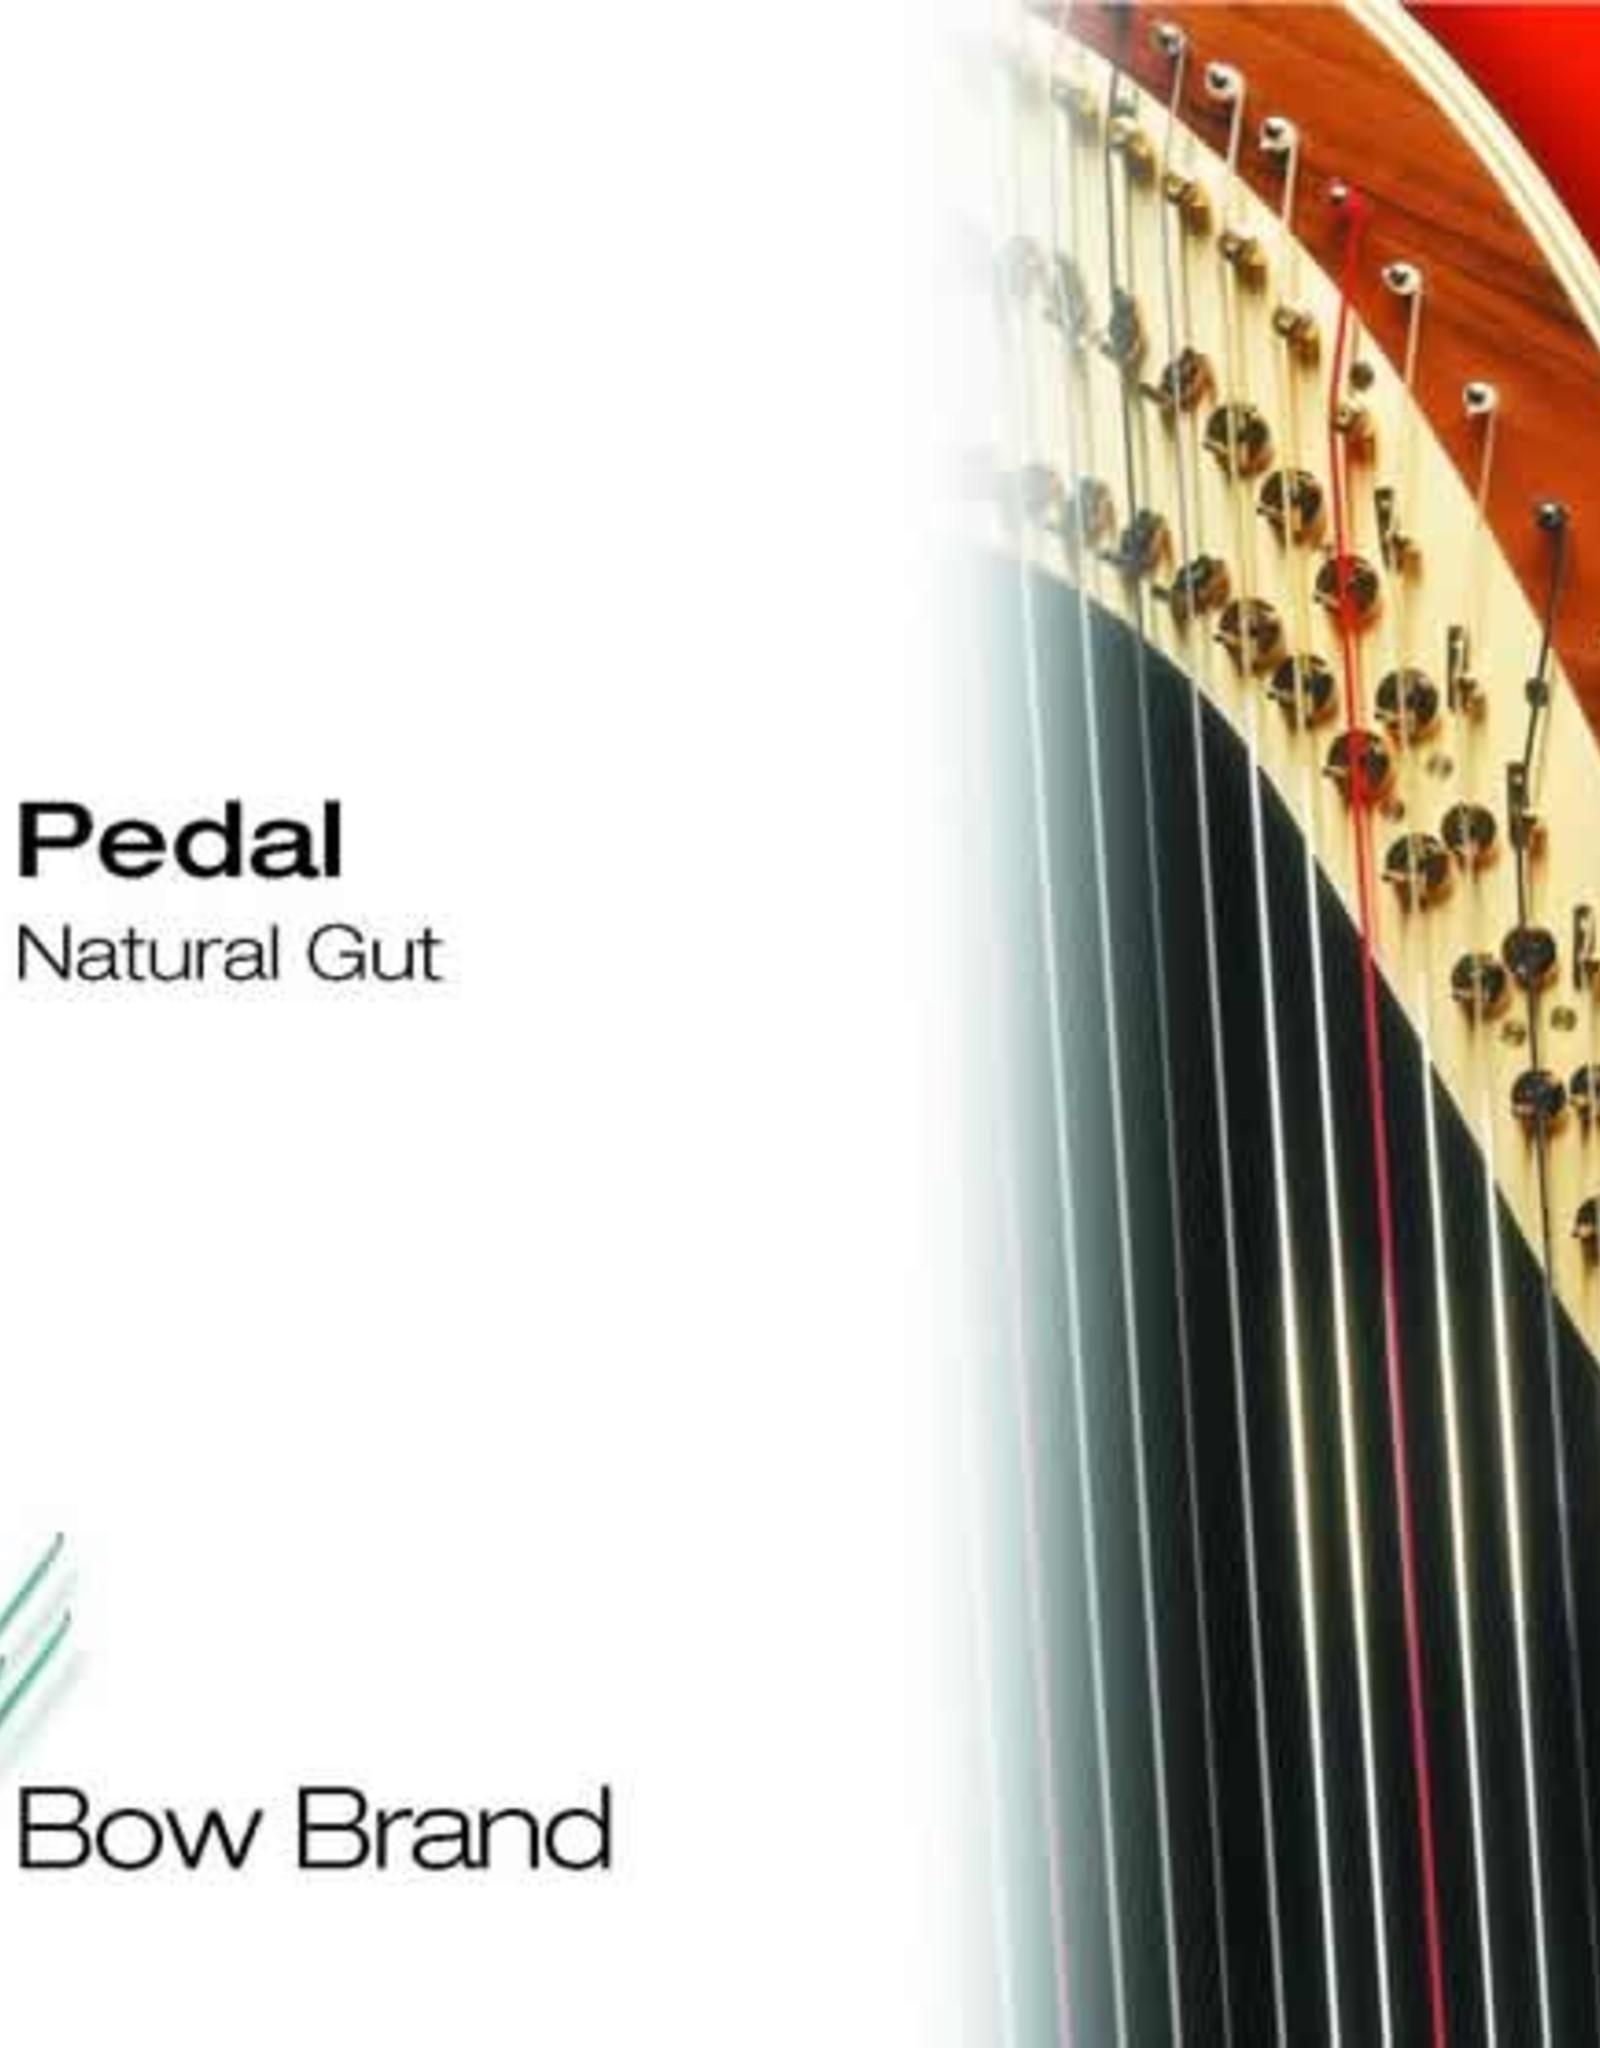 BOW BRAND  pedaal darm - pedal STD GUT 28/4 fa